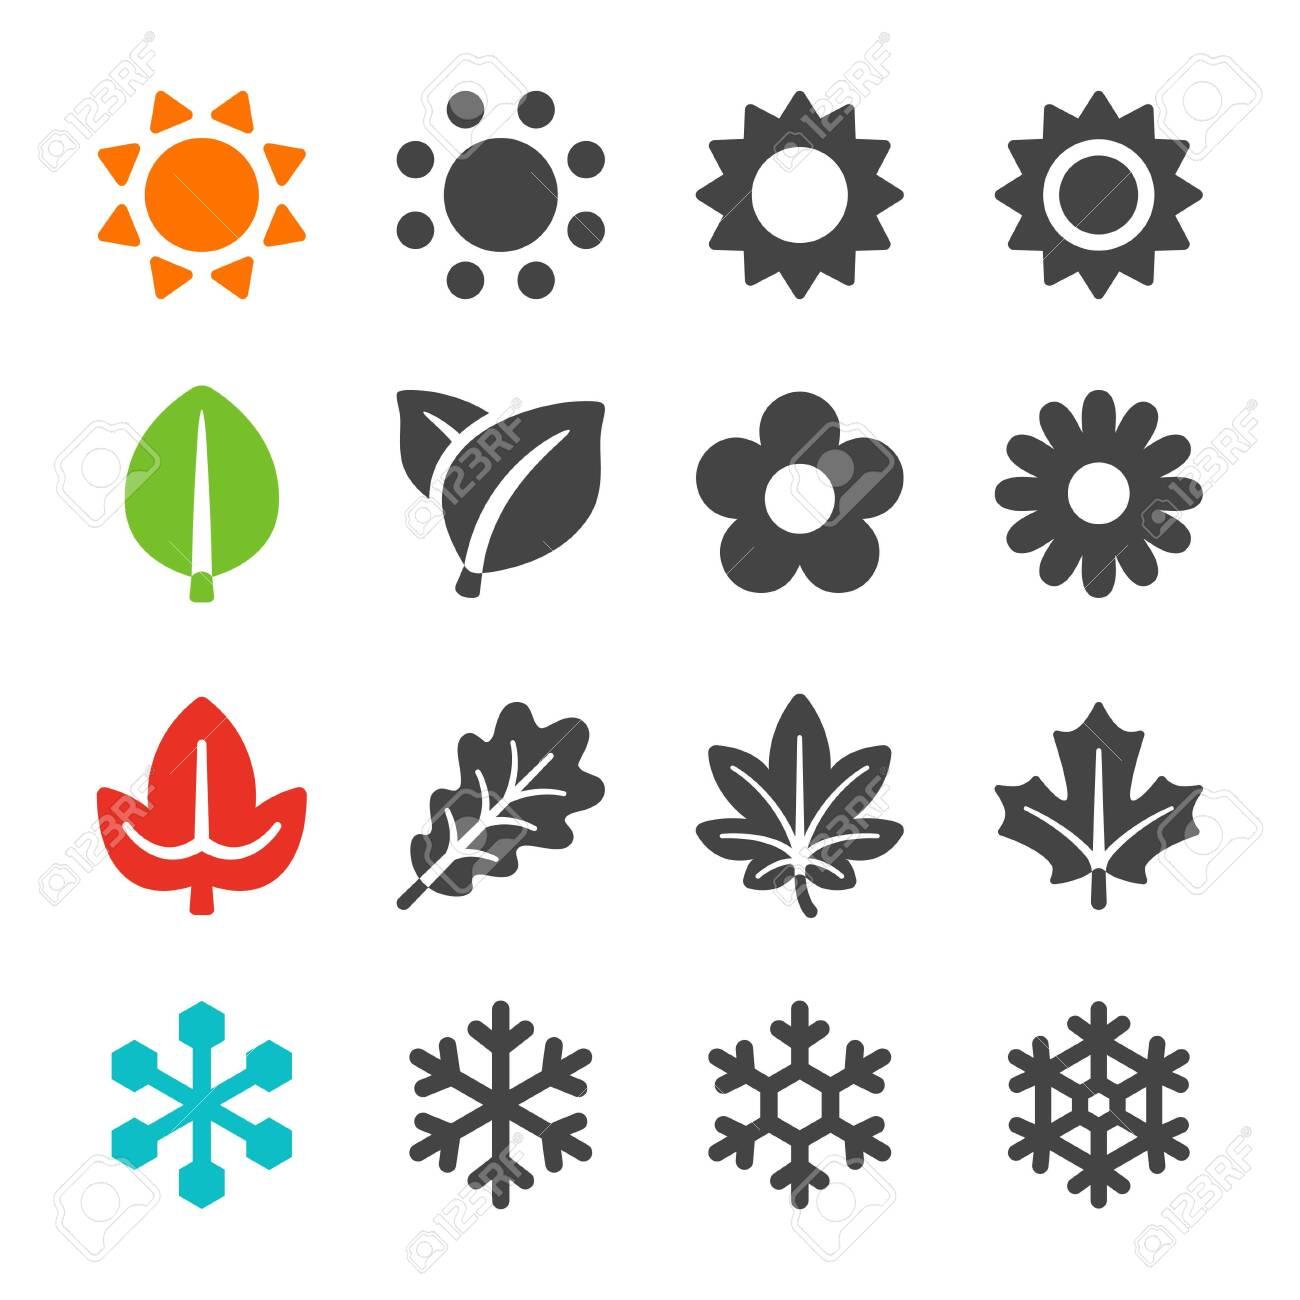 four season icon set,vector and illustration - 130771835